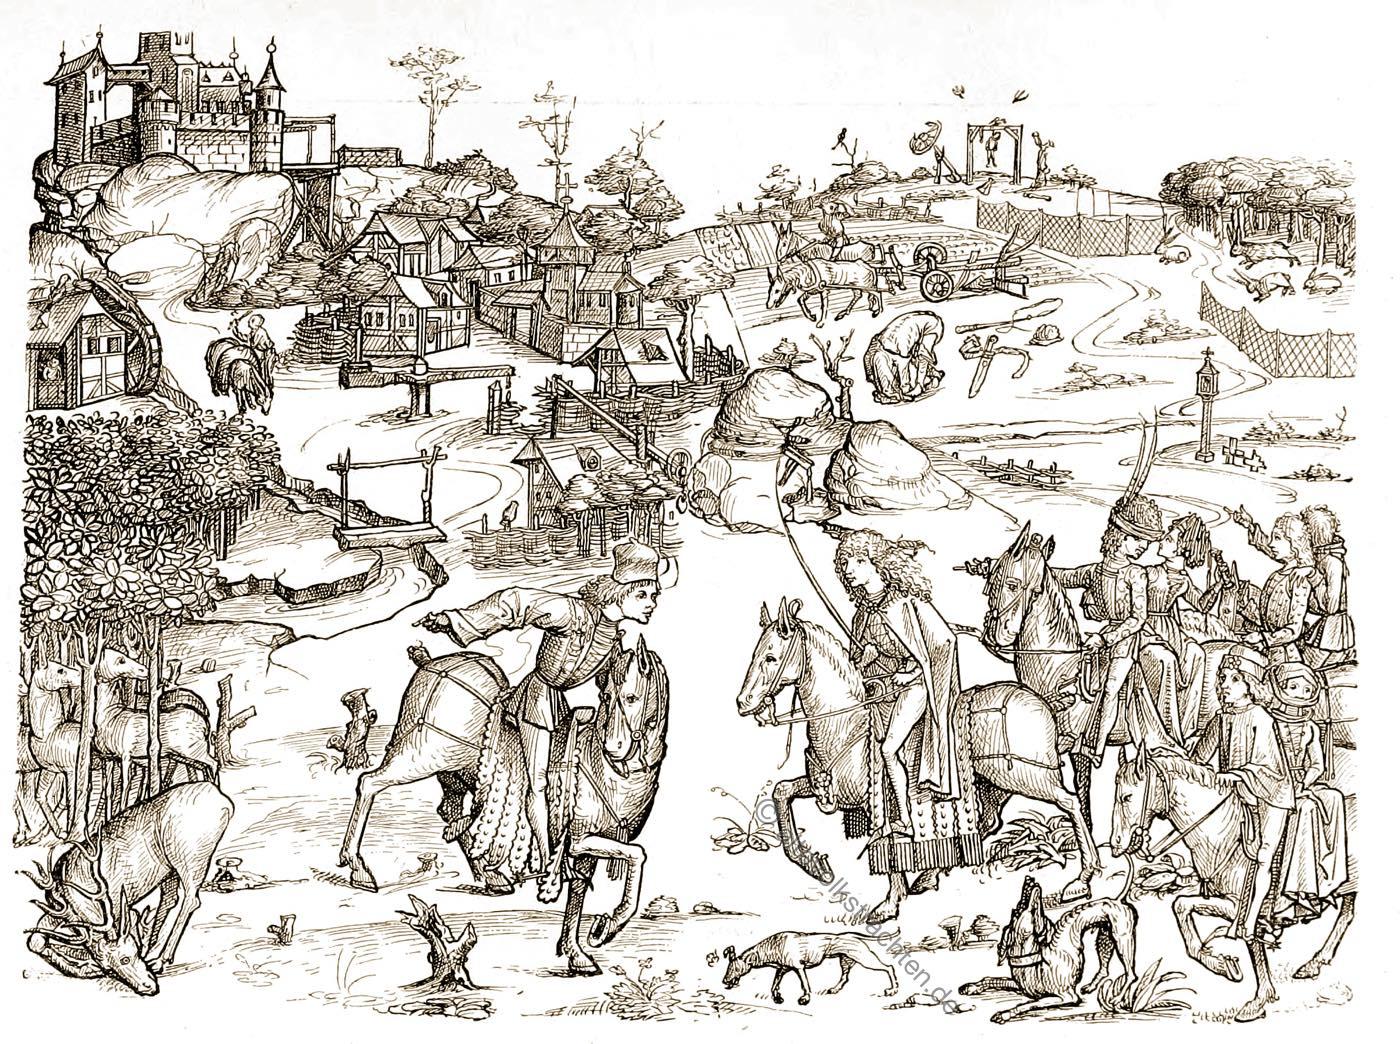 Mittelalter, Dorf, Hausbuch, Schloss, Wolfegg